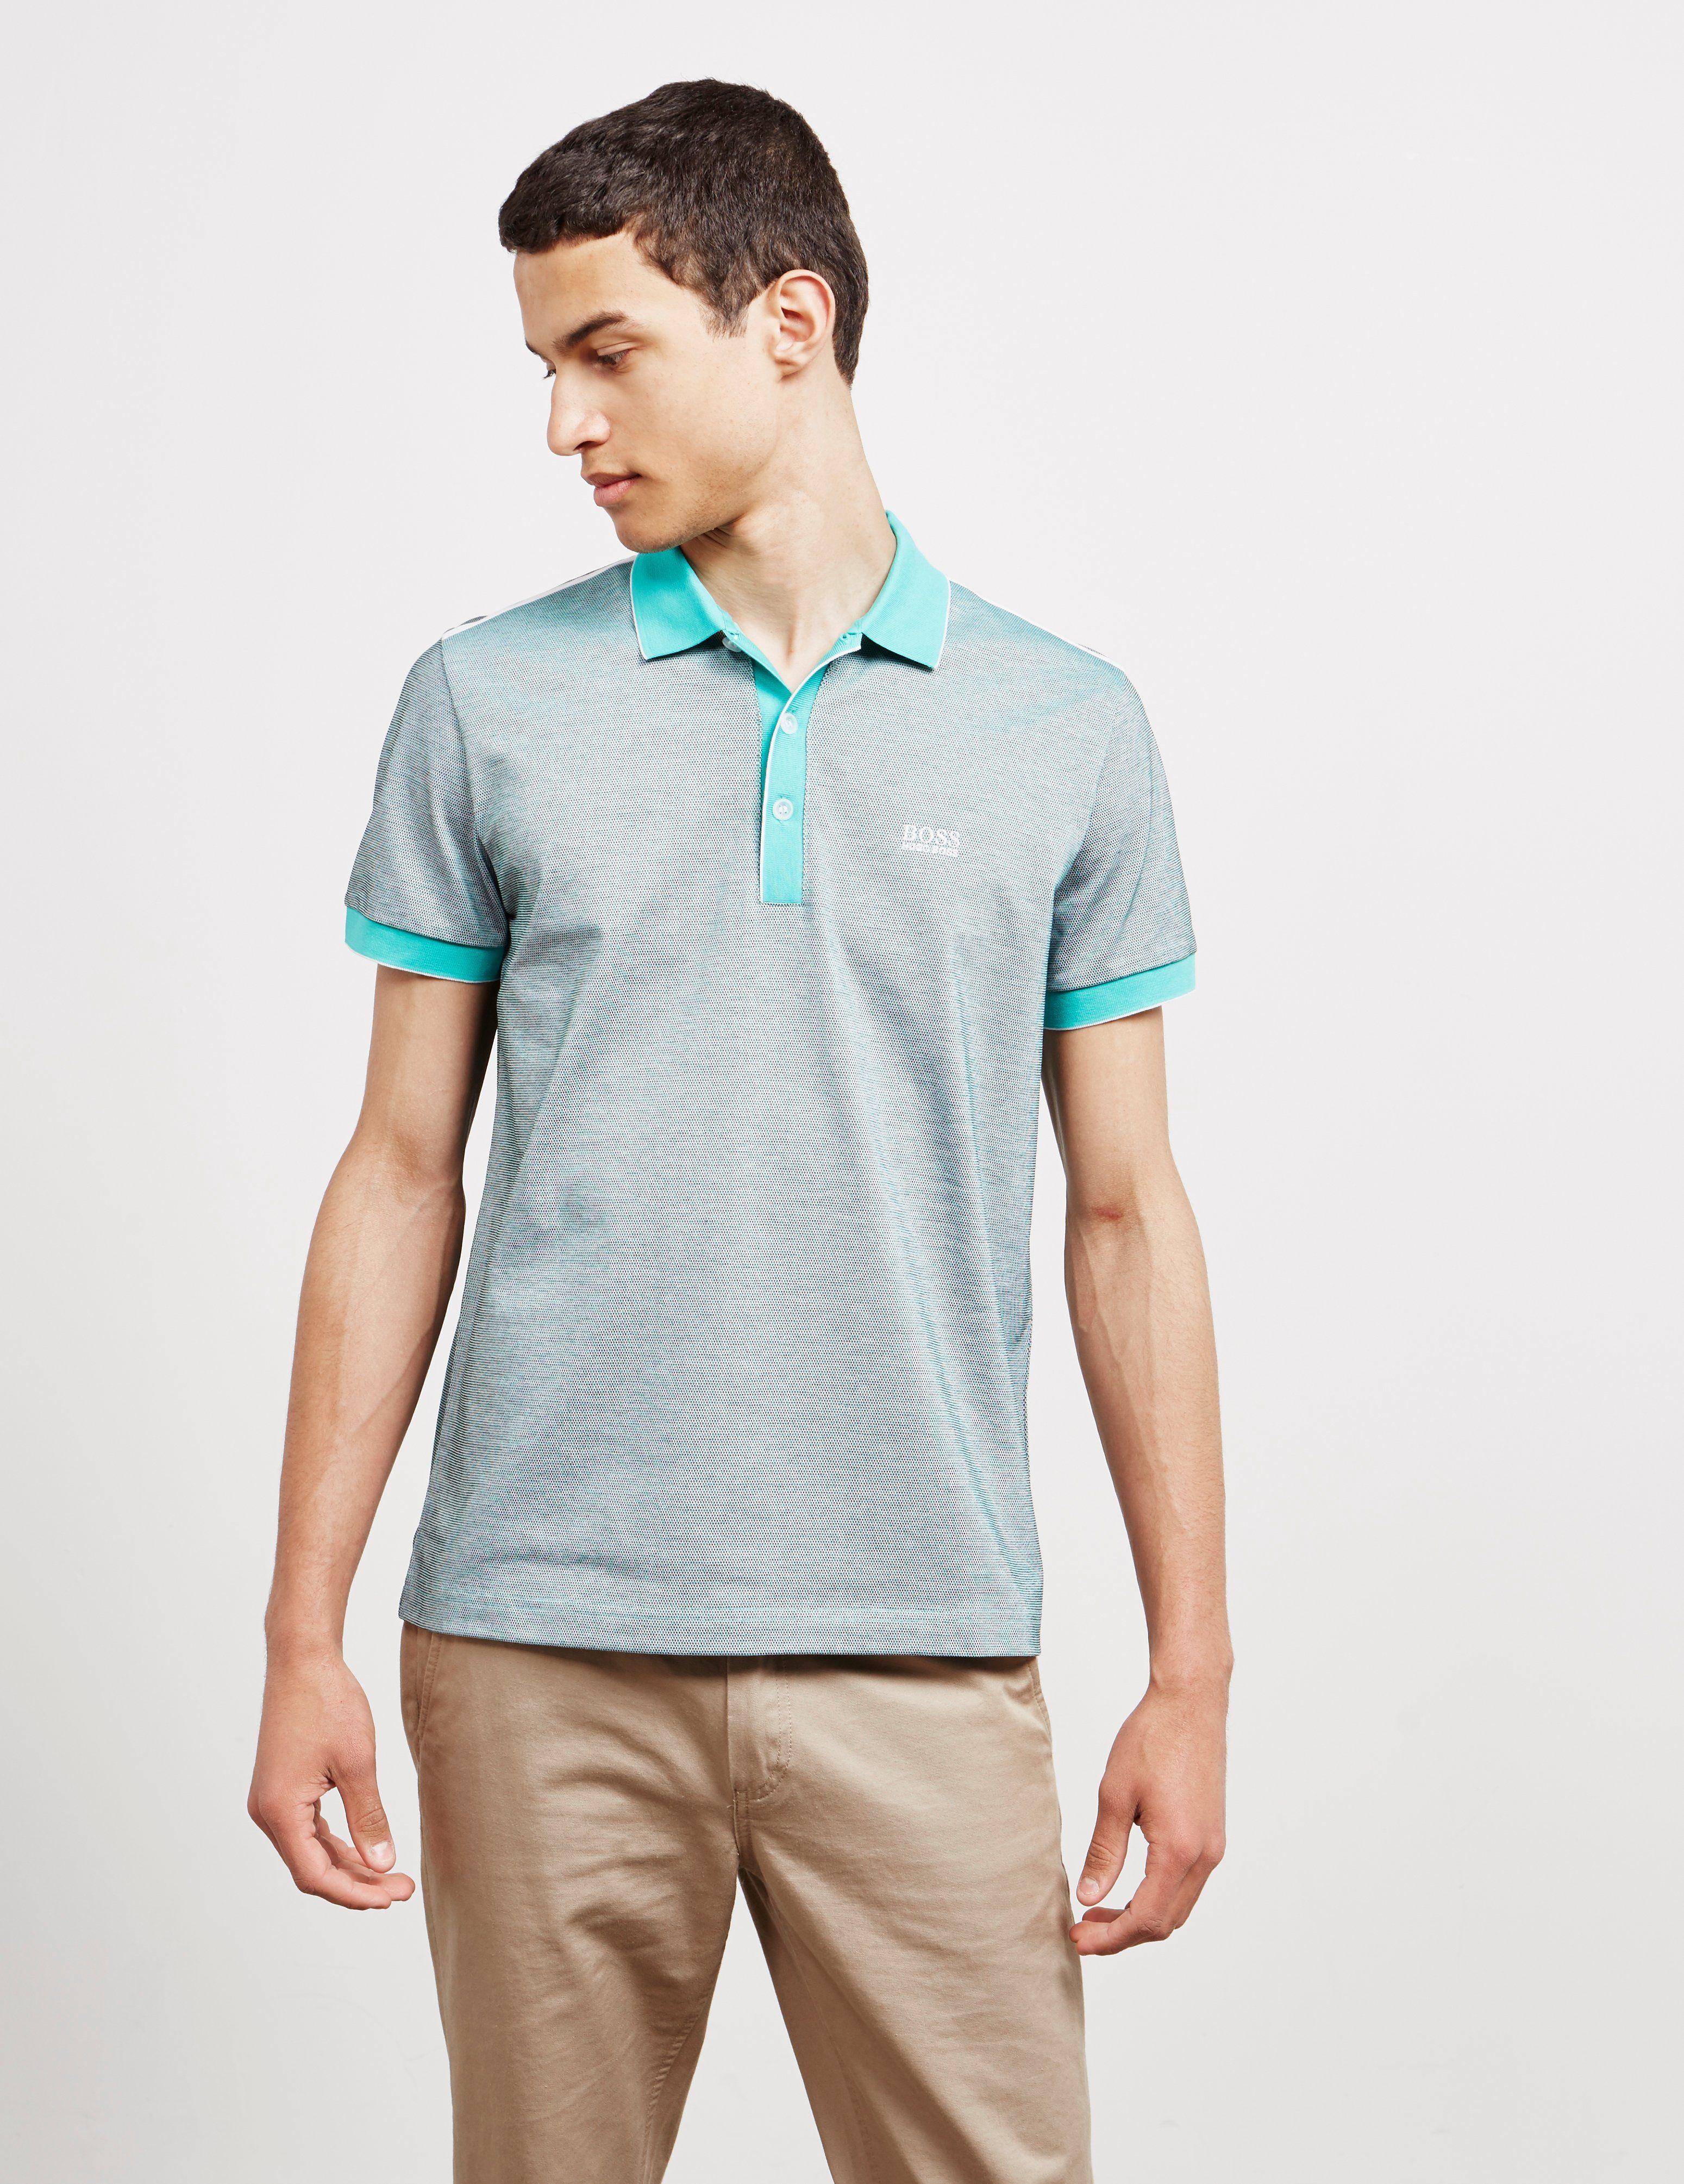 BOSS Paddy 2 Short Sleeve Polo Shirt